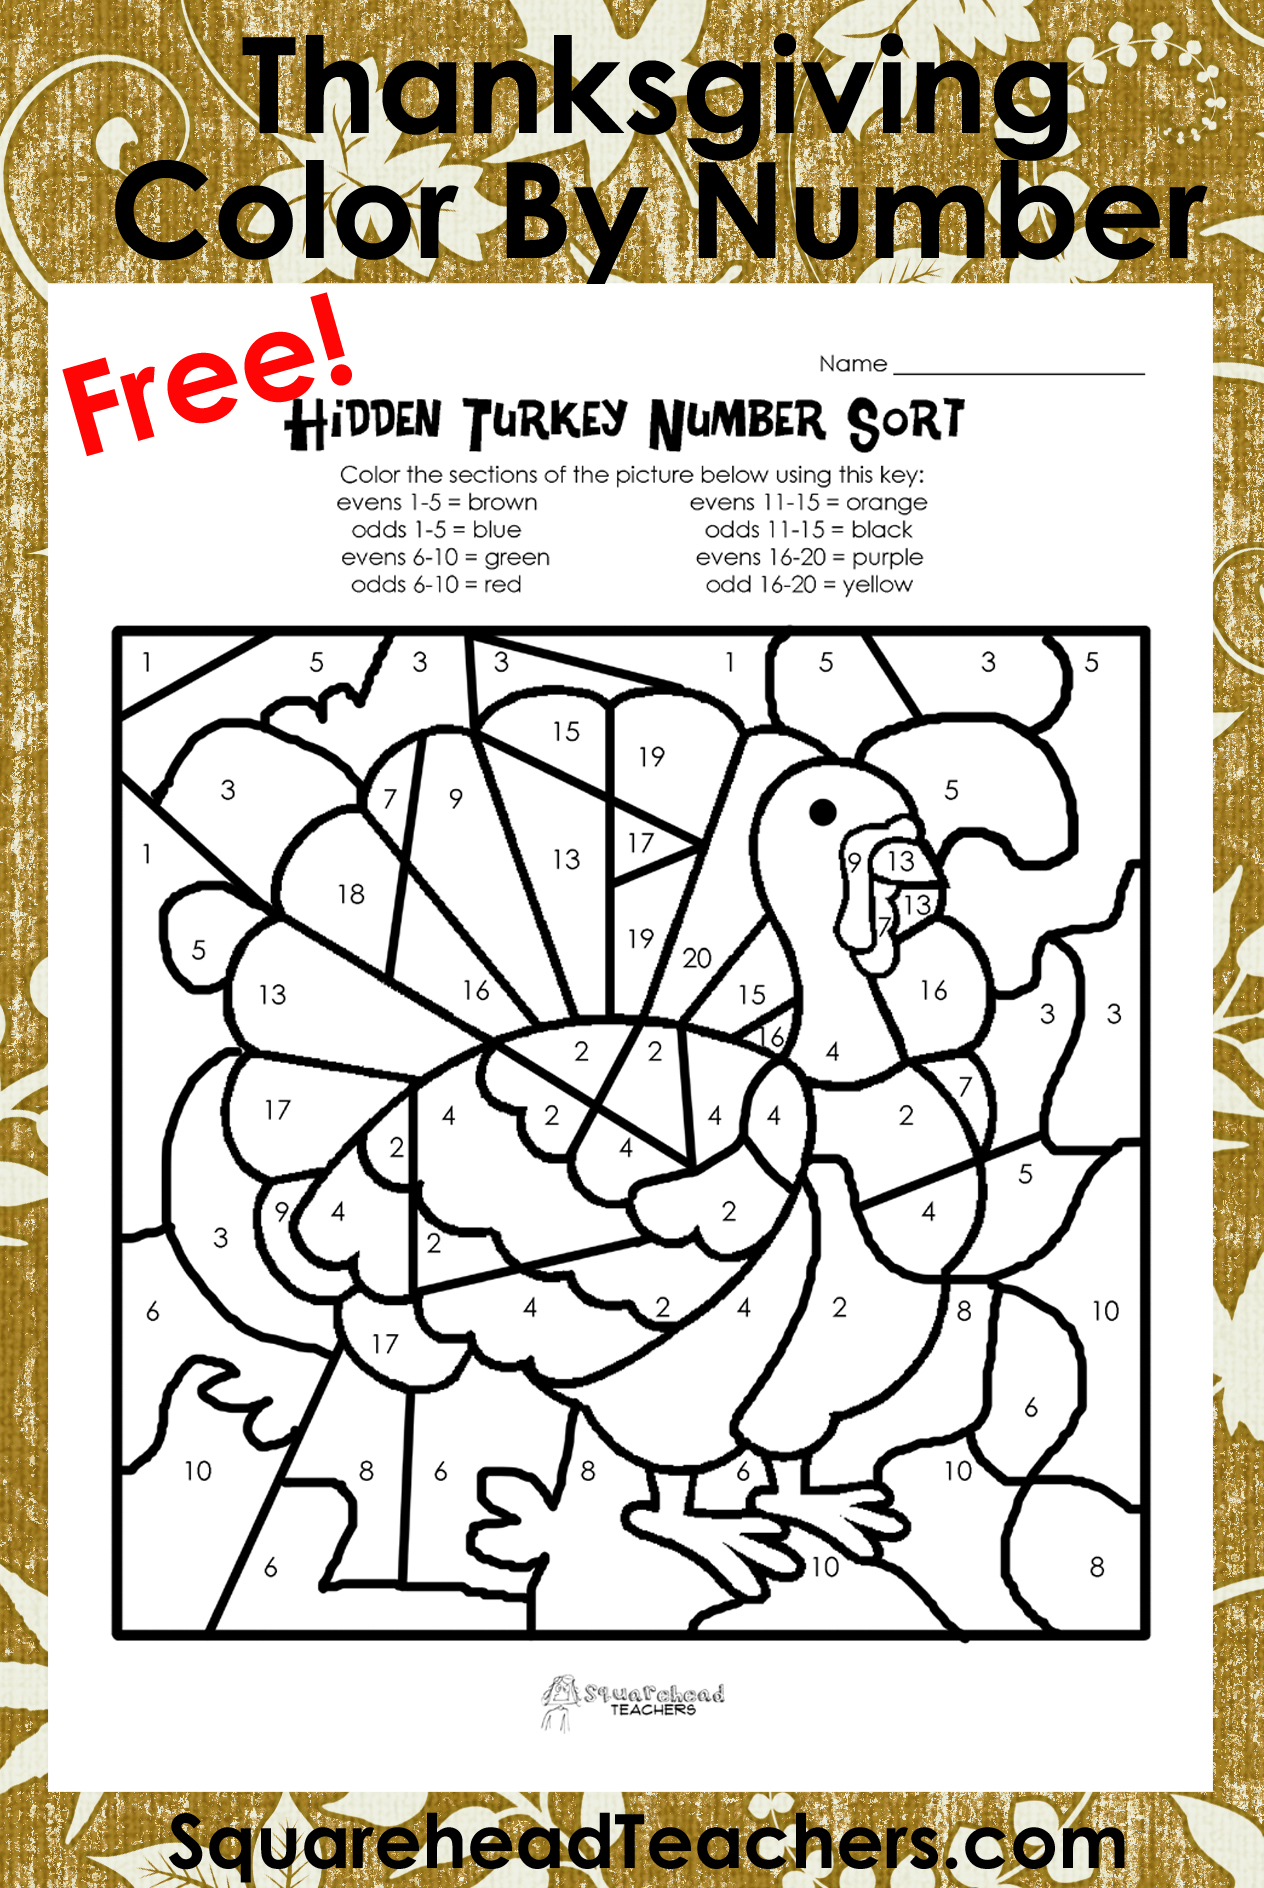 Thanksgiving Colornumber (Odd/evens Sort) | Squarehead Teachers - Math Worksheets Thanksgiving Free Printable